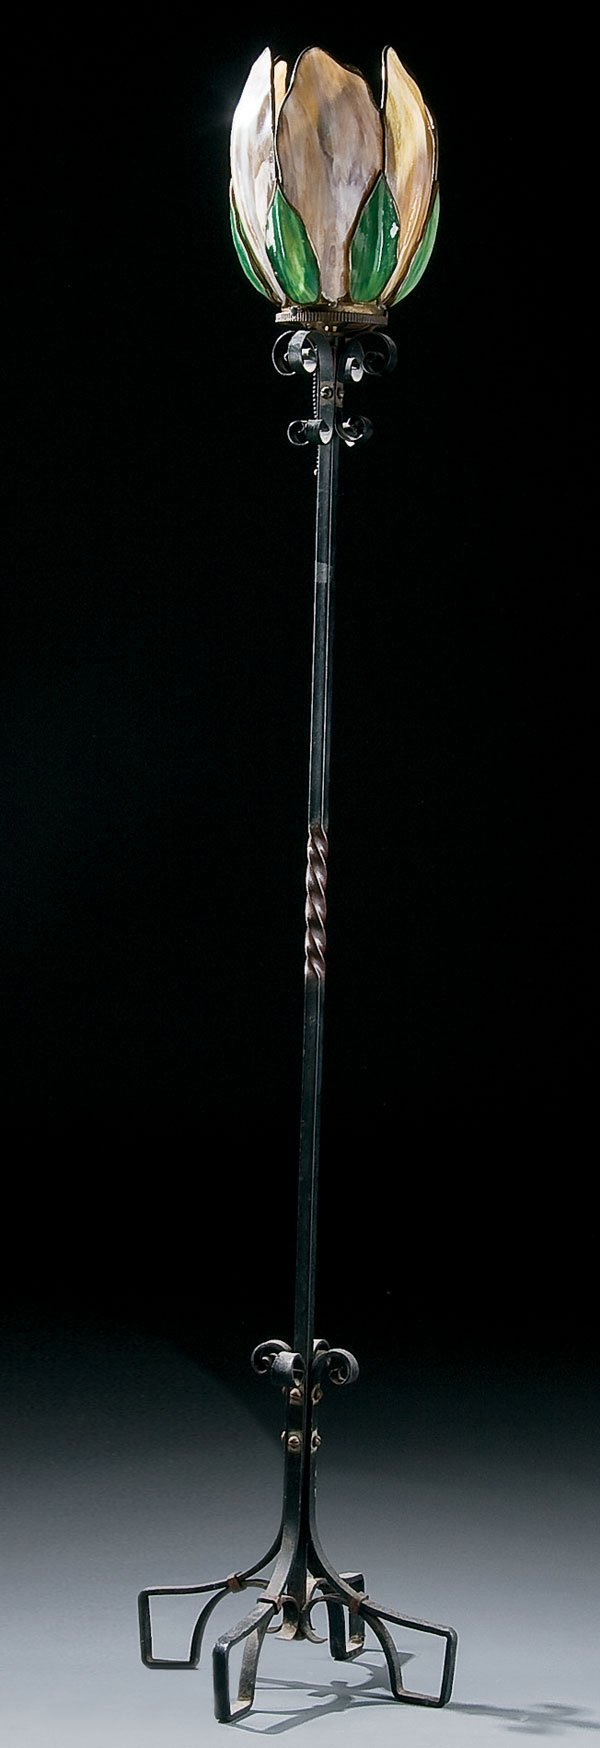 455: Lighting, attr. to Handel glass torcheire lamp